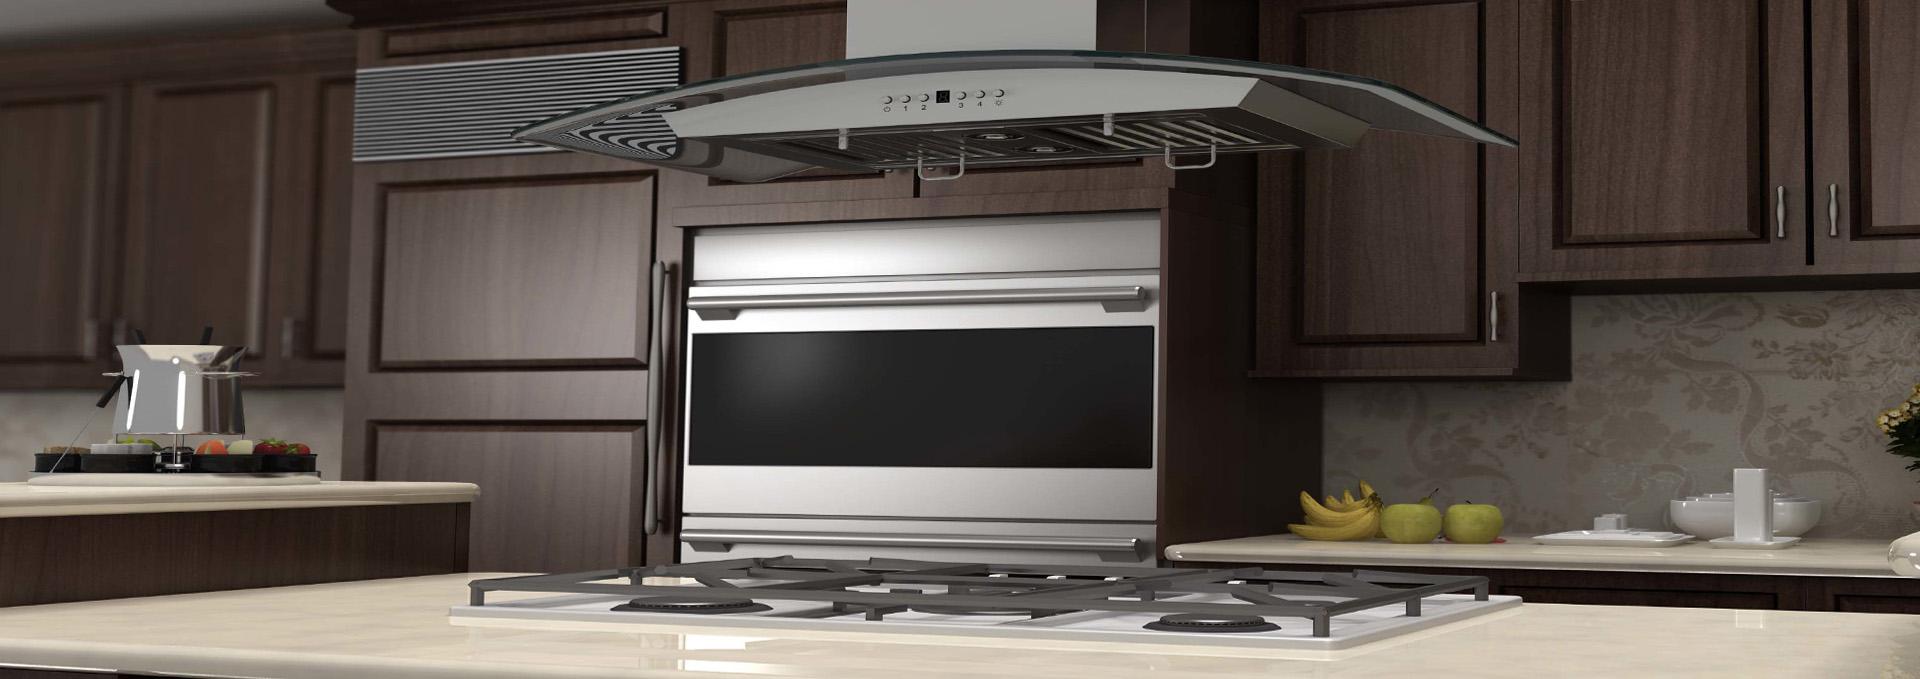 island kitchen hood ikea oak cabinets range extractor cfm manufacturer